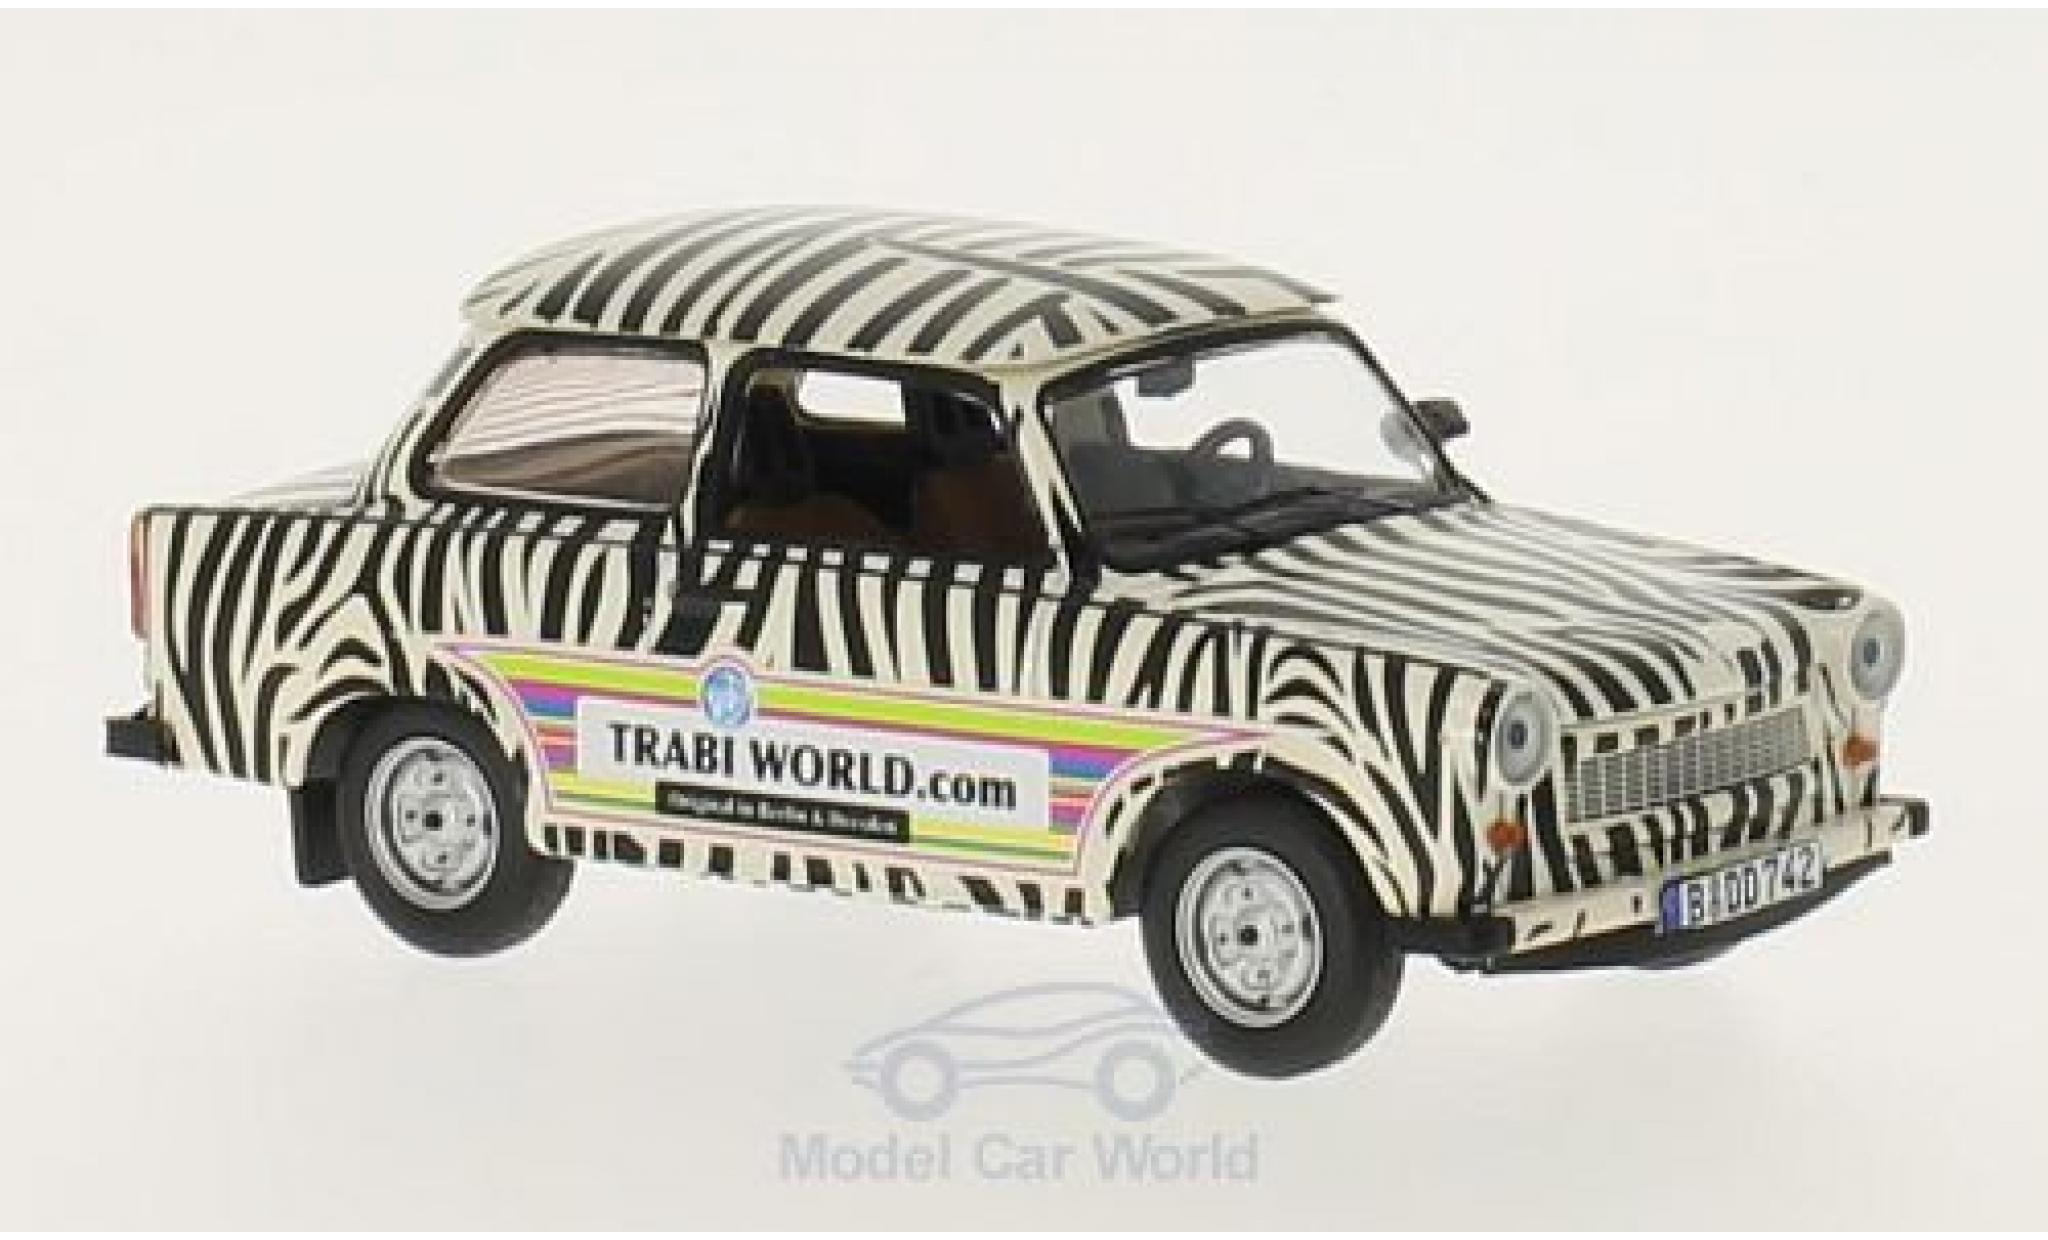 Trabant 601 1/43 IXO TrabiWorld.com 1970